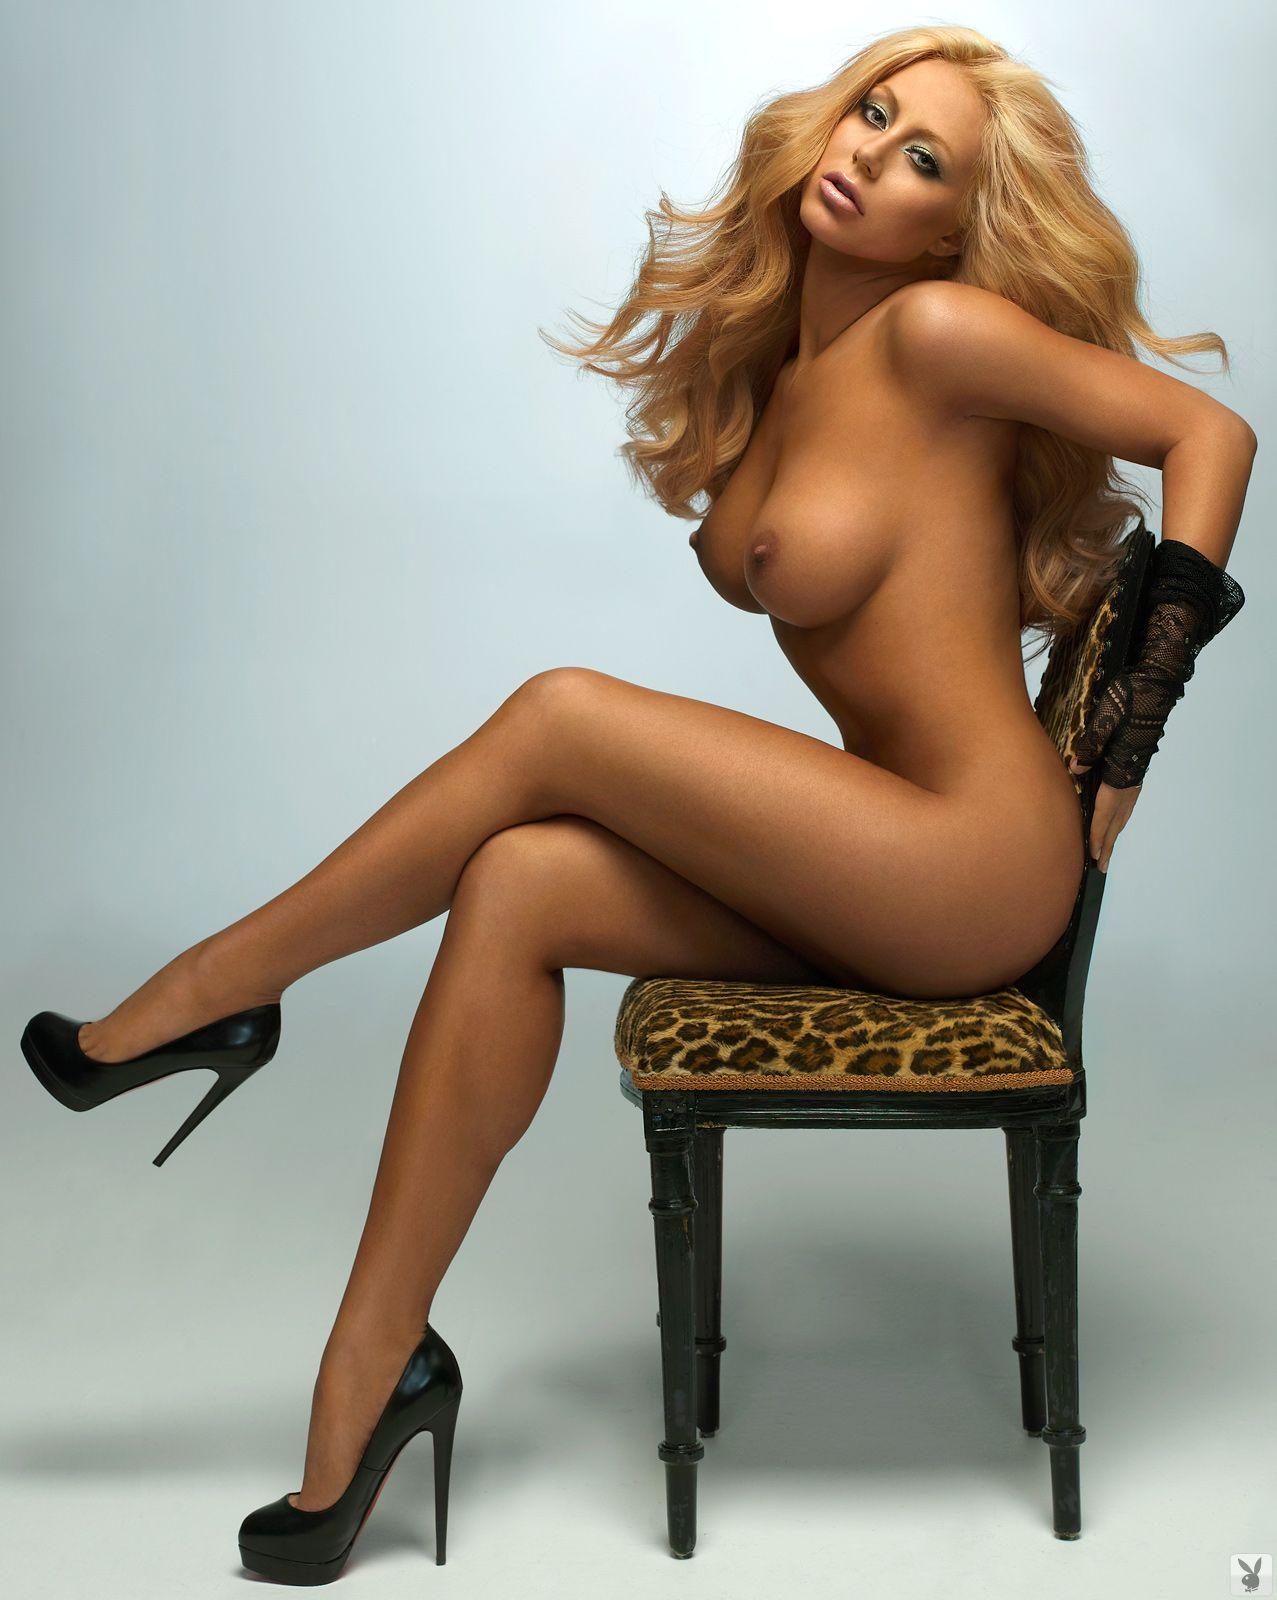 Nude Photos Of Aubrey O Day 91